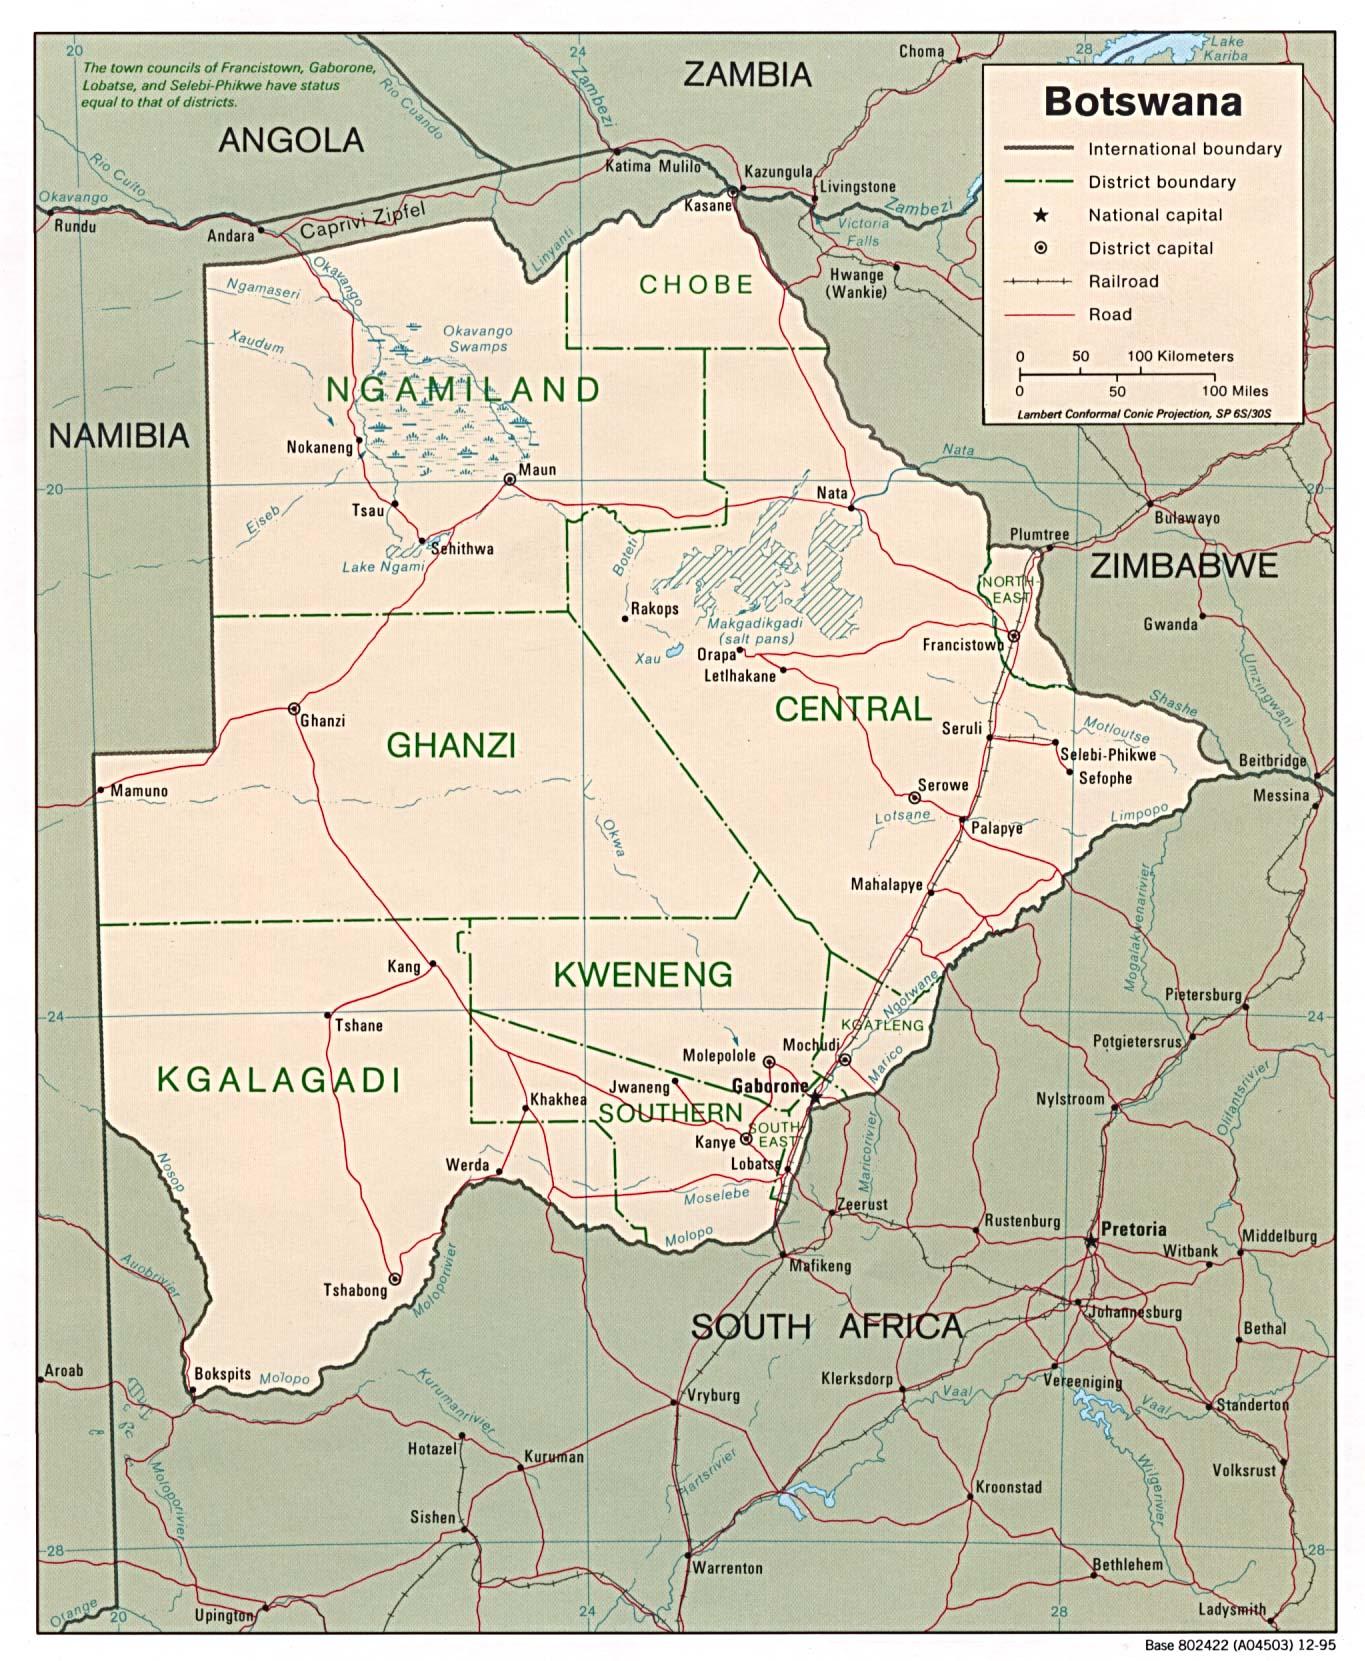 Mapa Politico de Botsuana